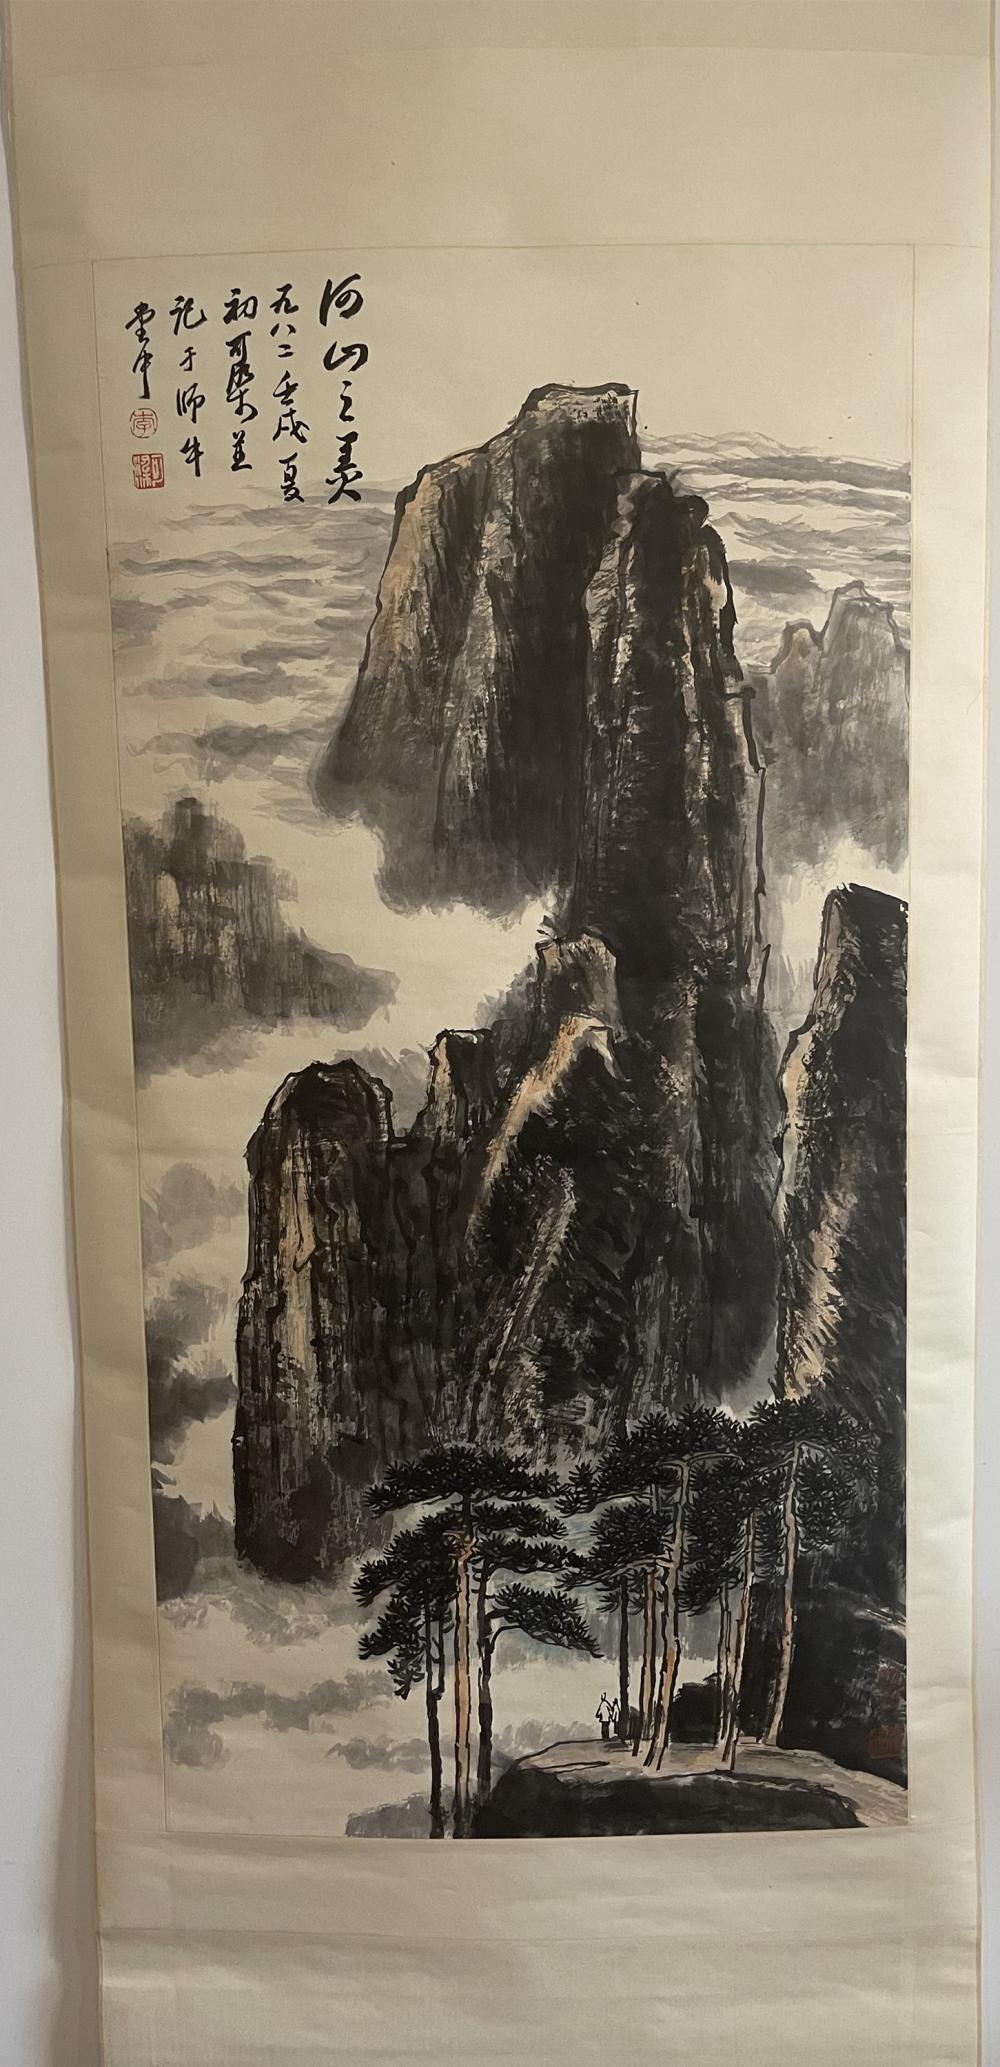 Li Keran, Landscape Drawing